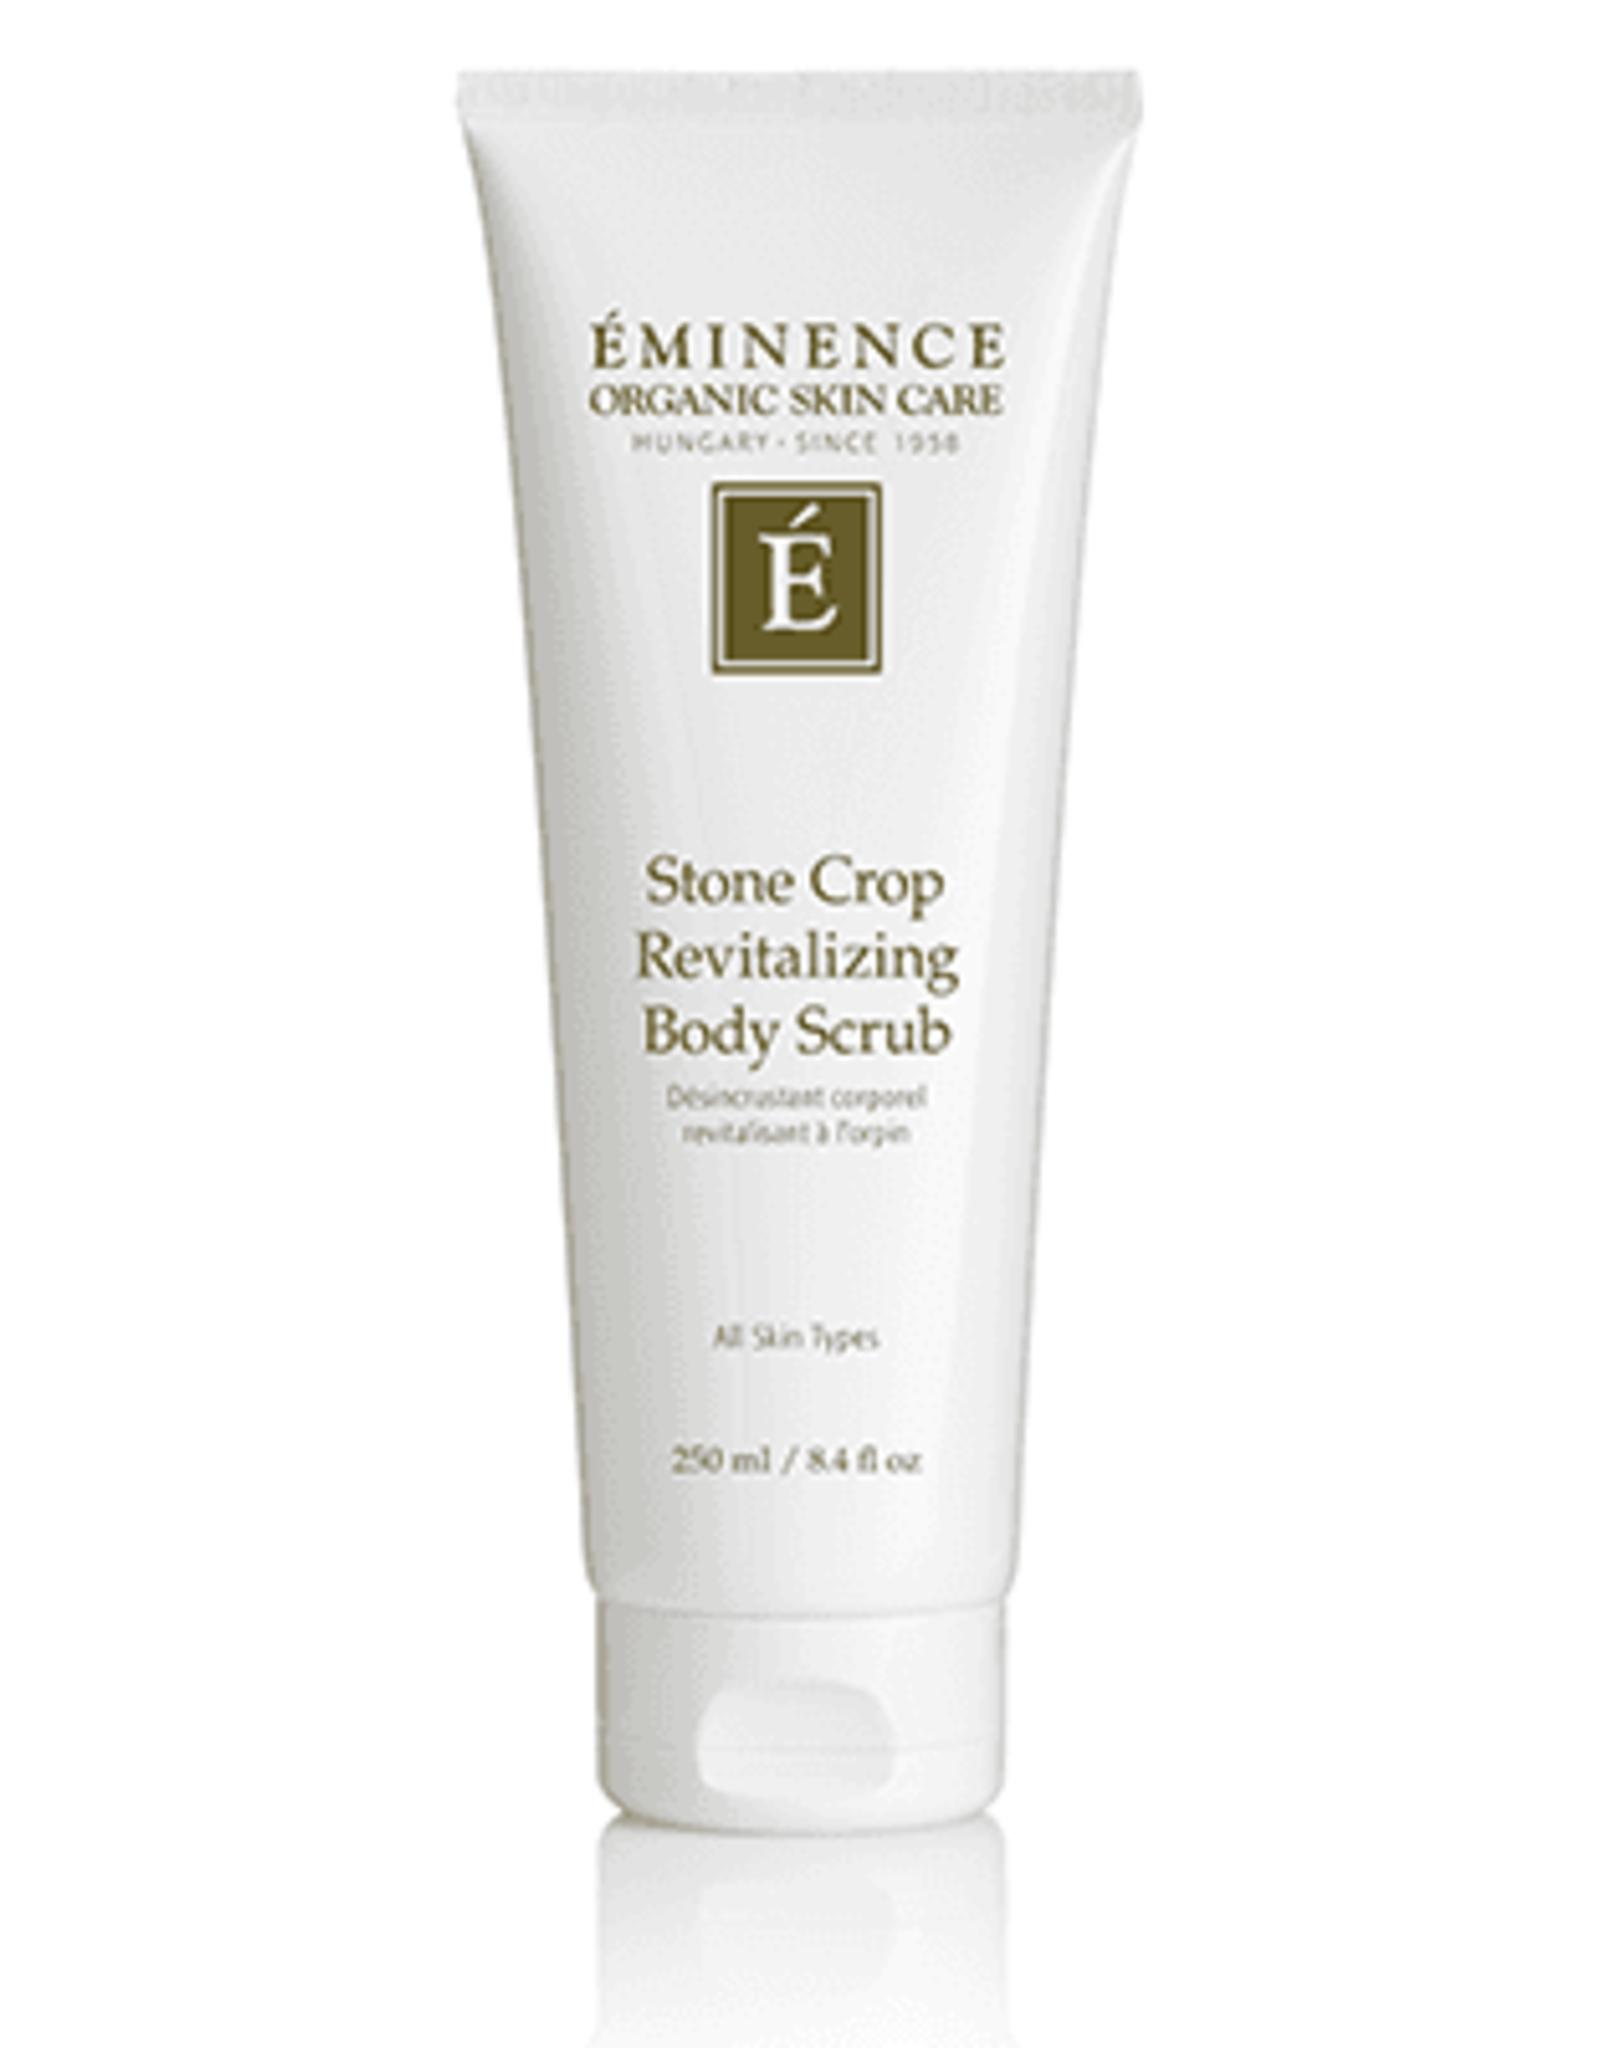 Eminence Organic Skin Care *Stone Crop Revitalizing Body Scrub